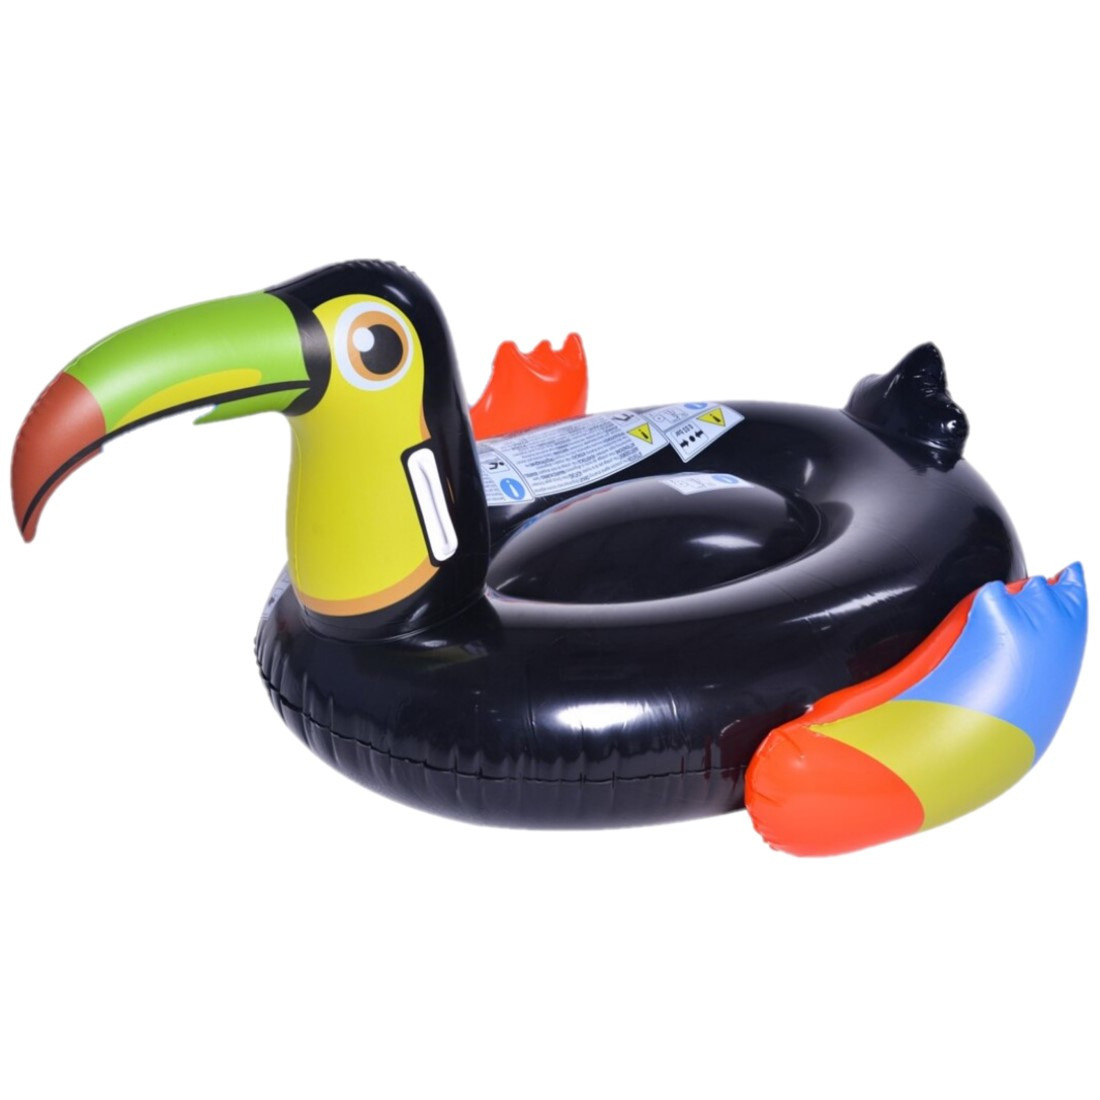 Opblaasbare zwembad luchtbed-ride-on dieren toekan 128 x 104 cm